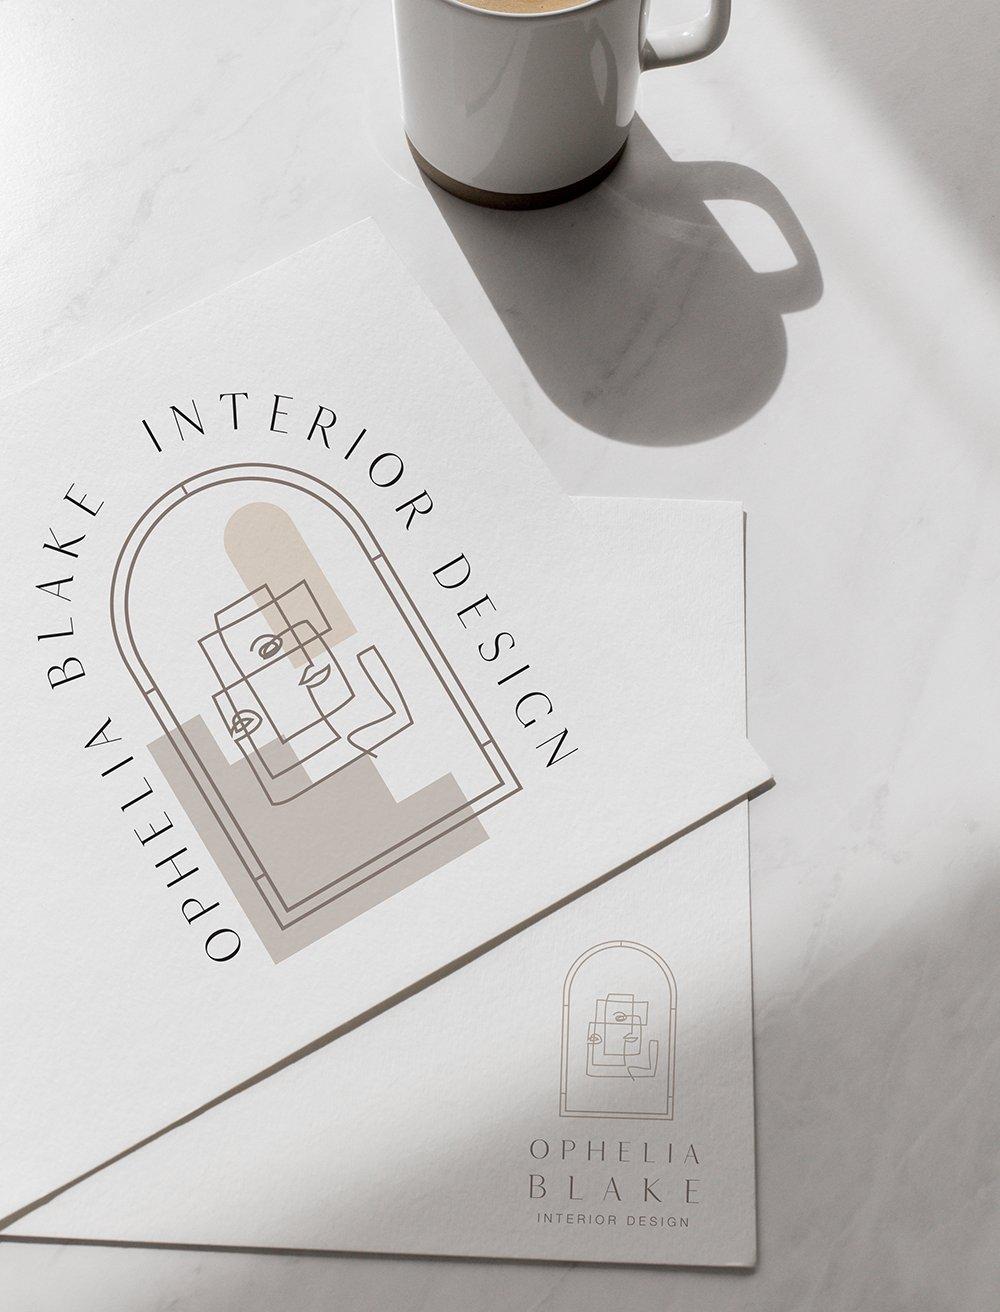 stylish, modern, arty logo design for Ophelia Blake Interior Design, a fine art interior design firm in London